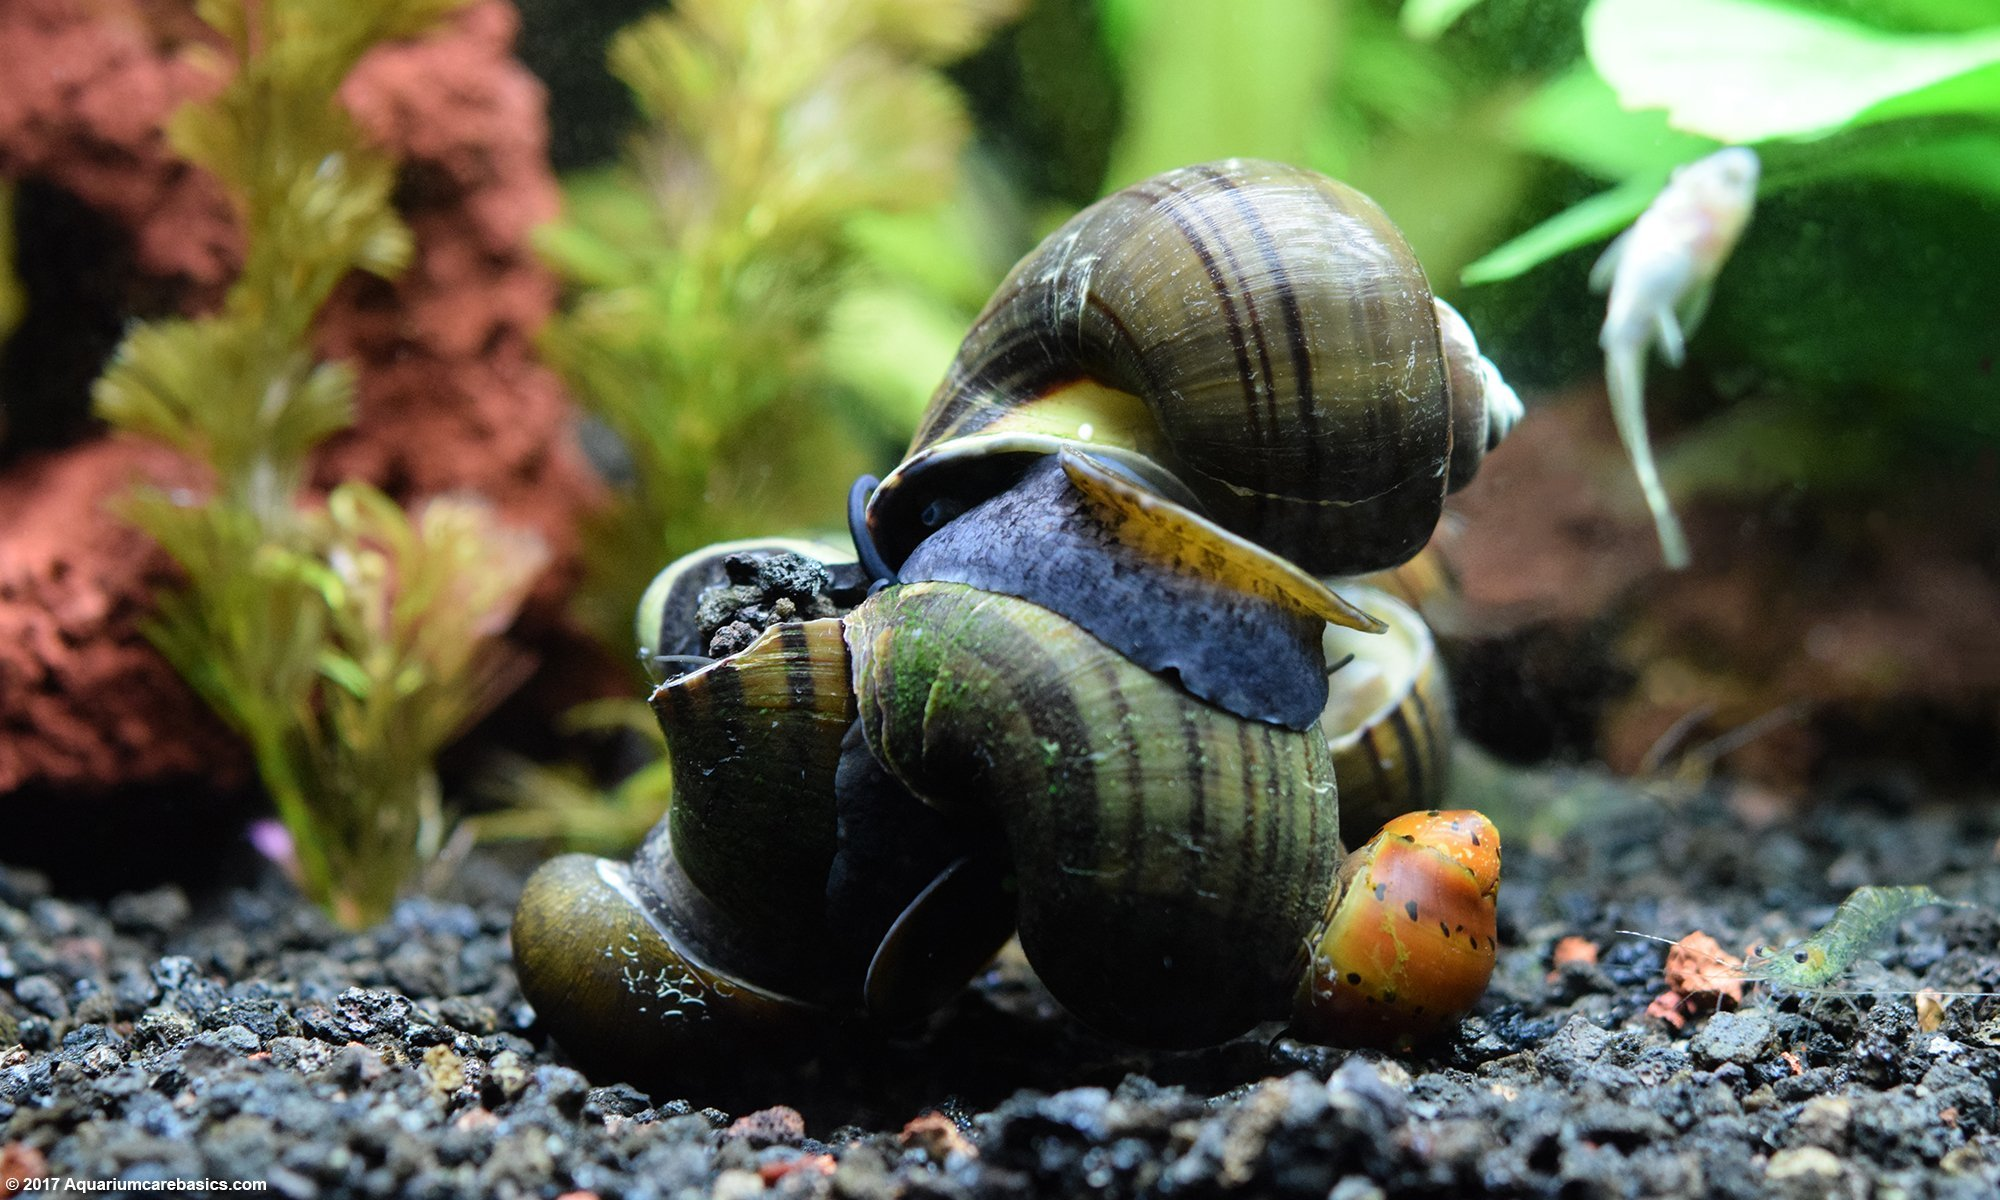 Snails freshwater fish tank